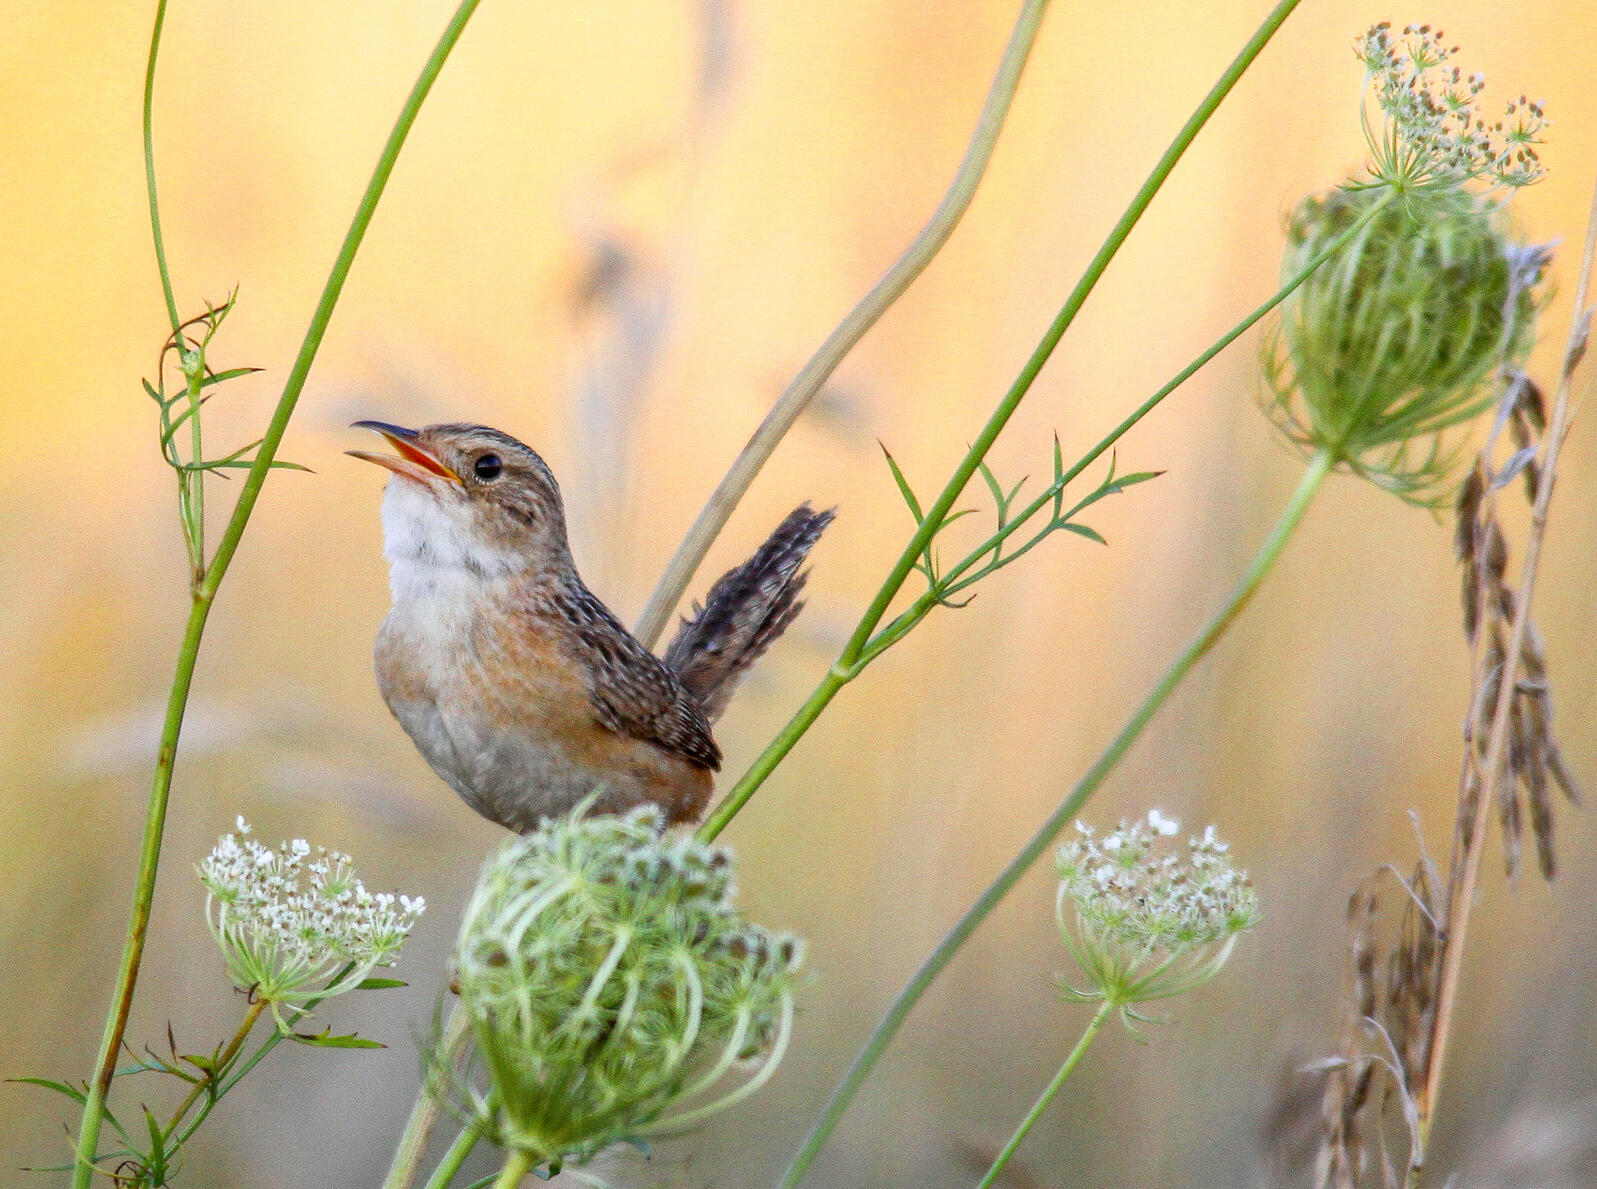 Sedge Wren. Ben Cvengros/Audubon Photography Awards